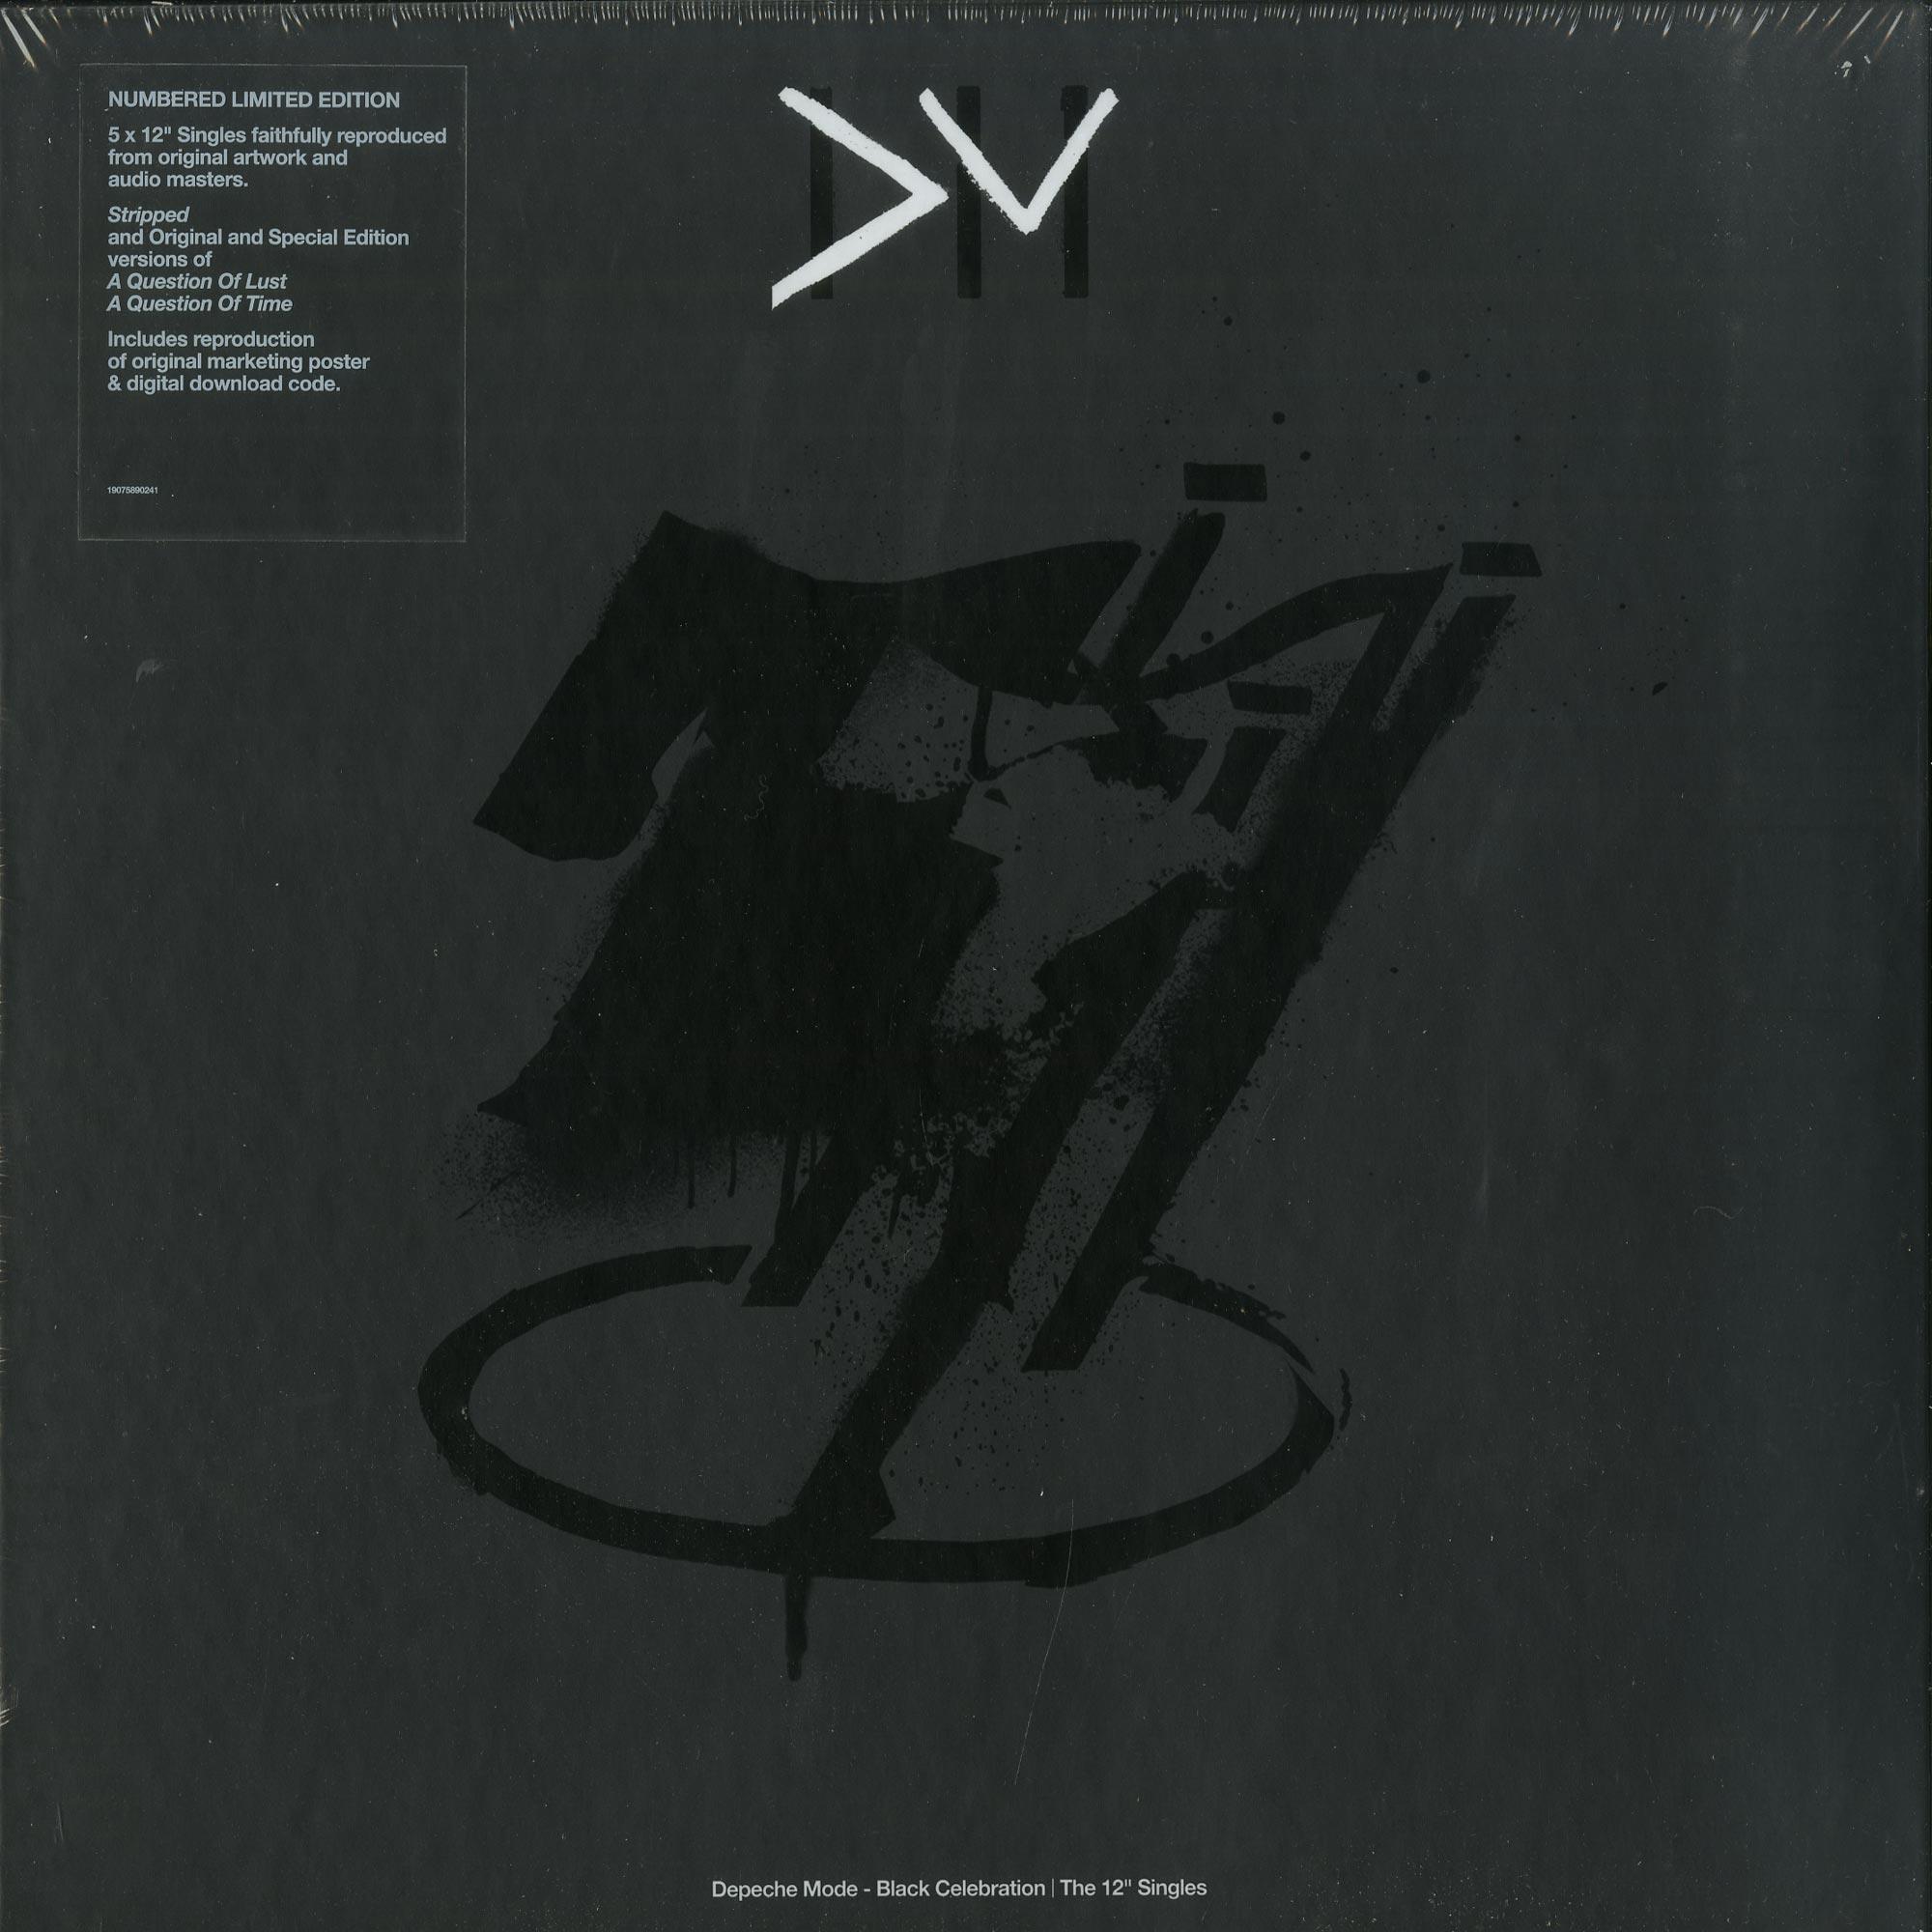 Depeche Mode - BLACK CELEBRATION-THE 12 Inch Singles